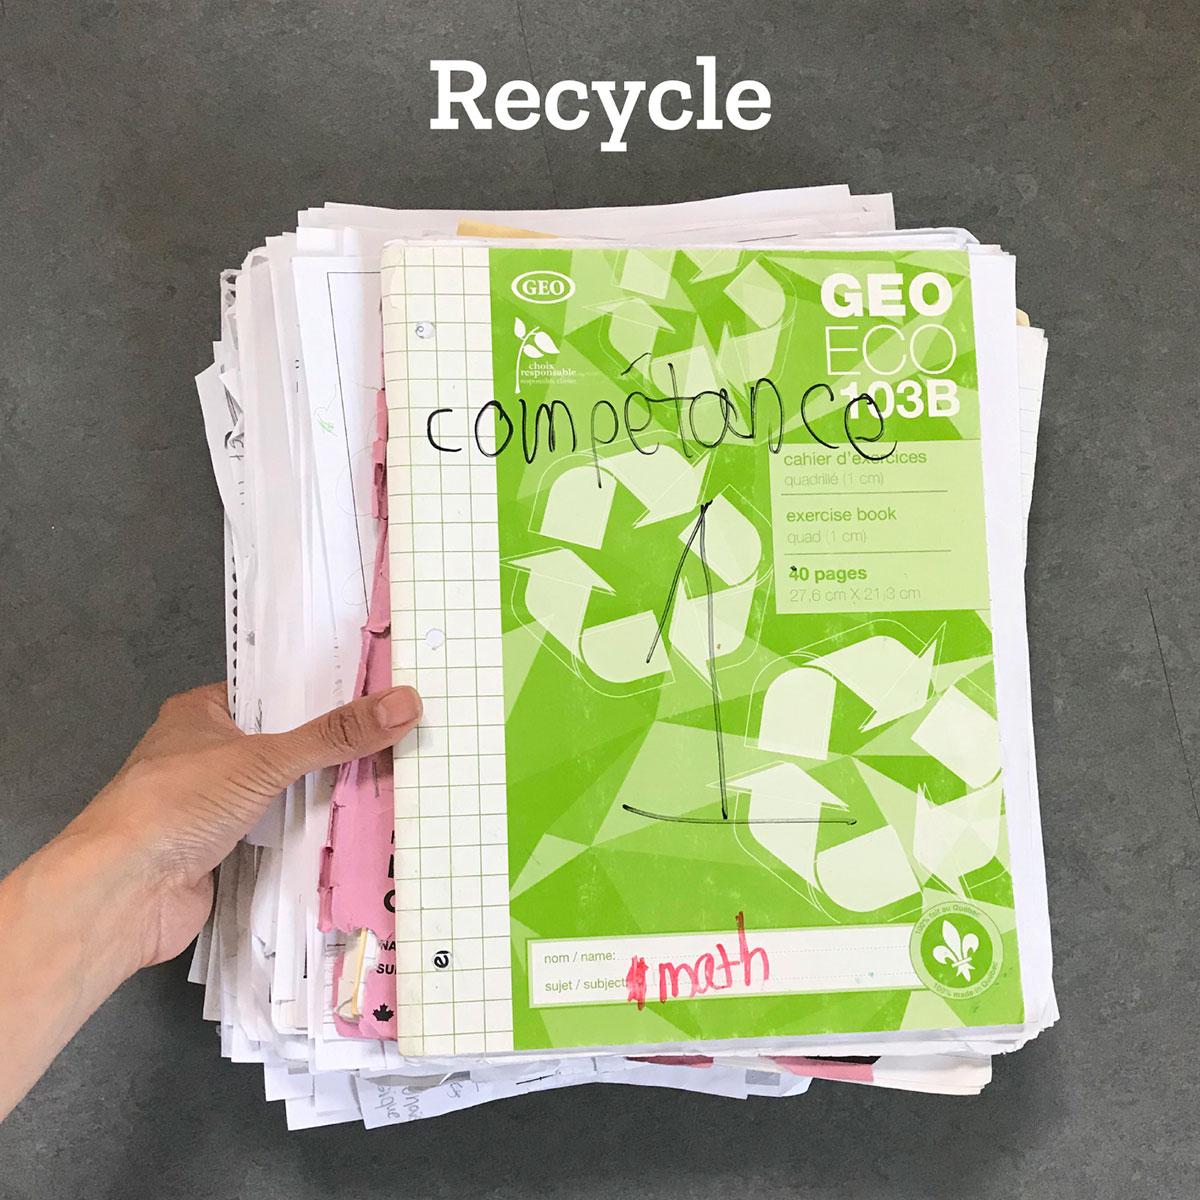 School Waste Tiny Trash Can